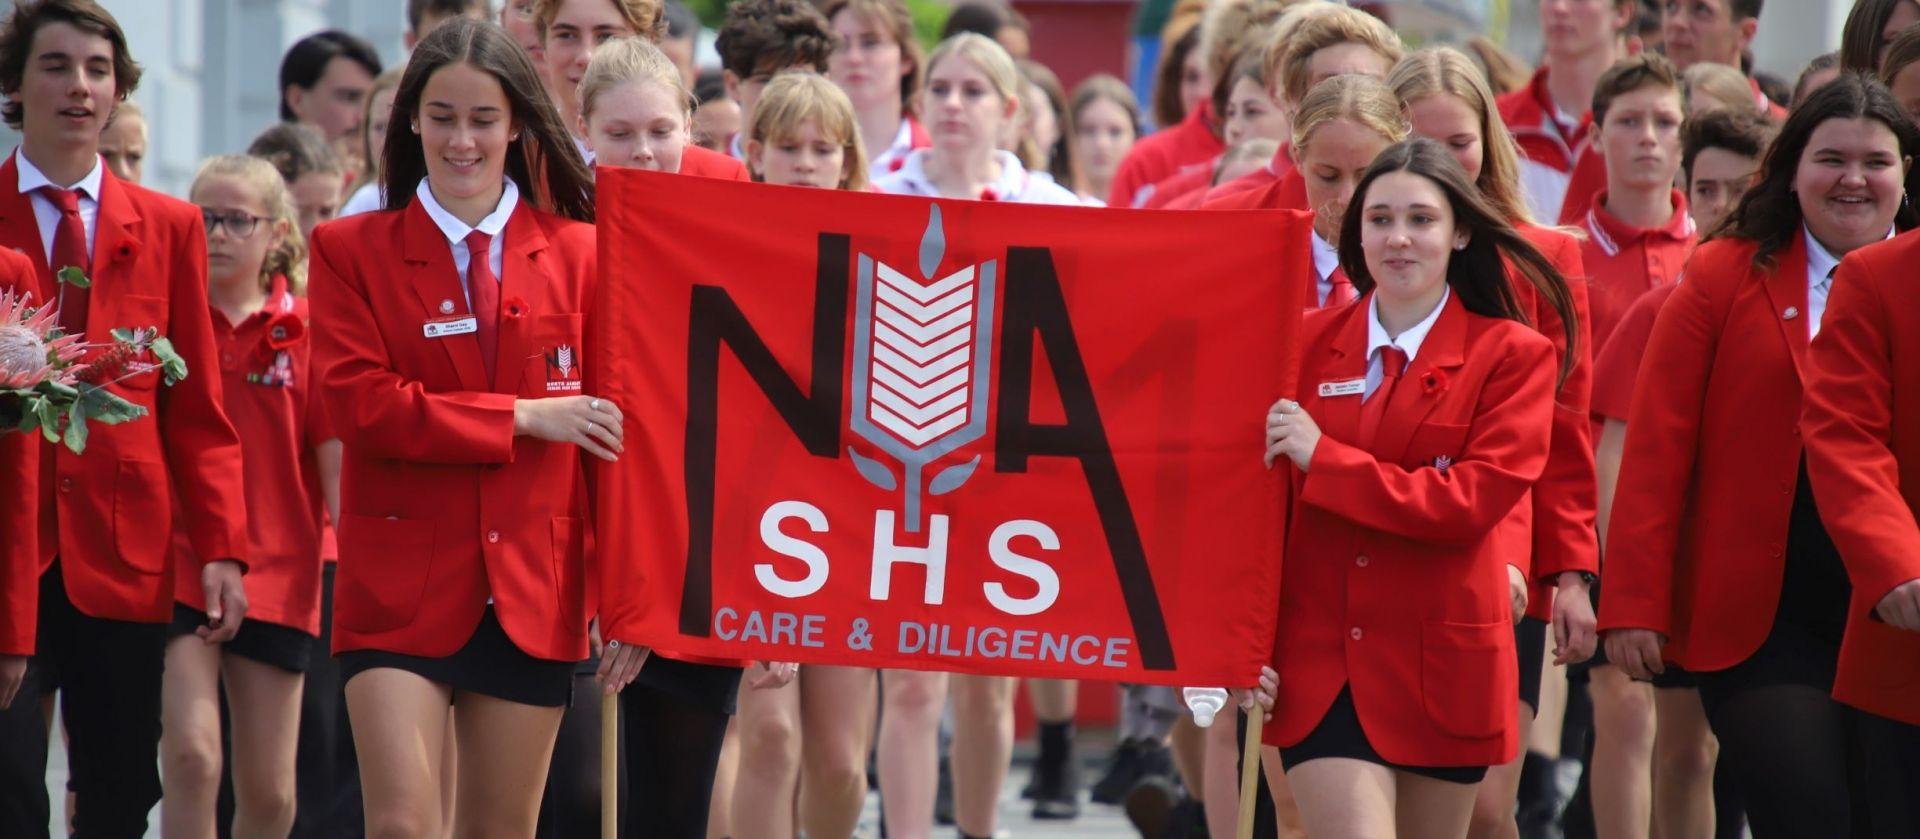 North Albany Senior High School